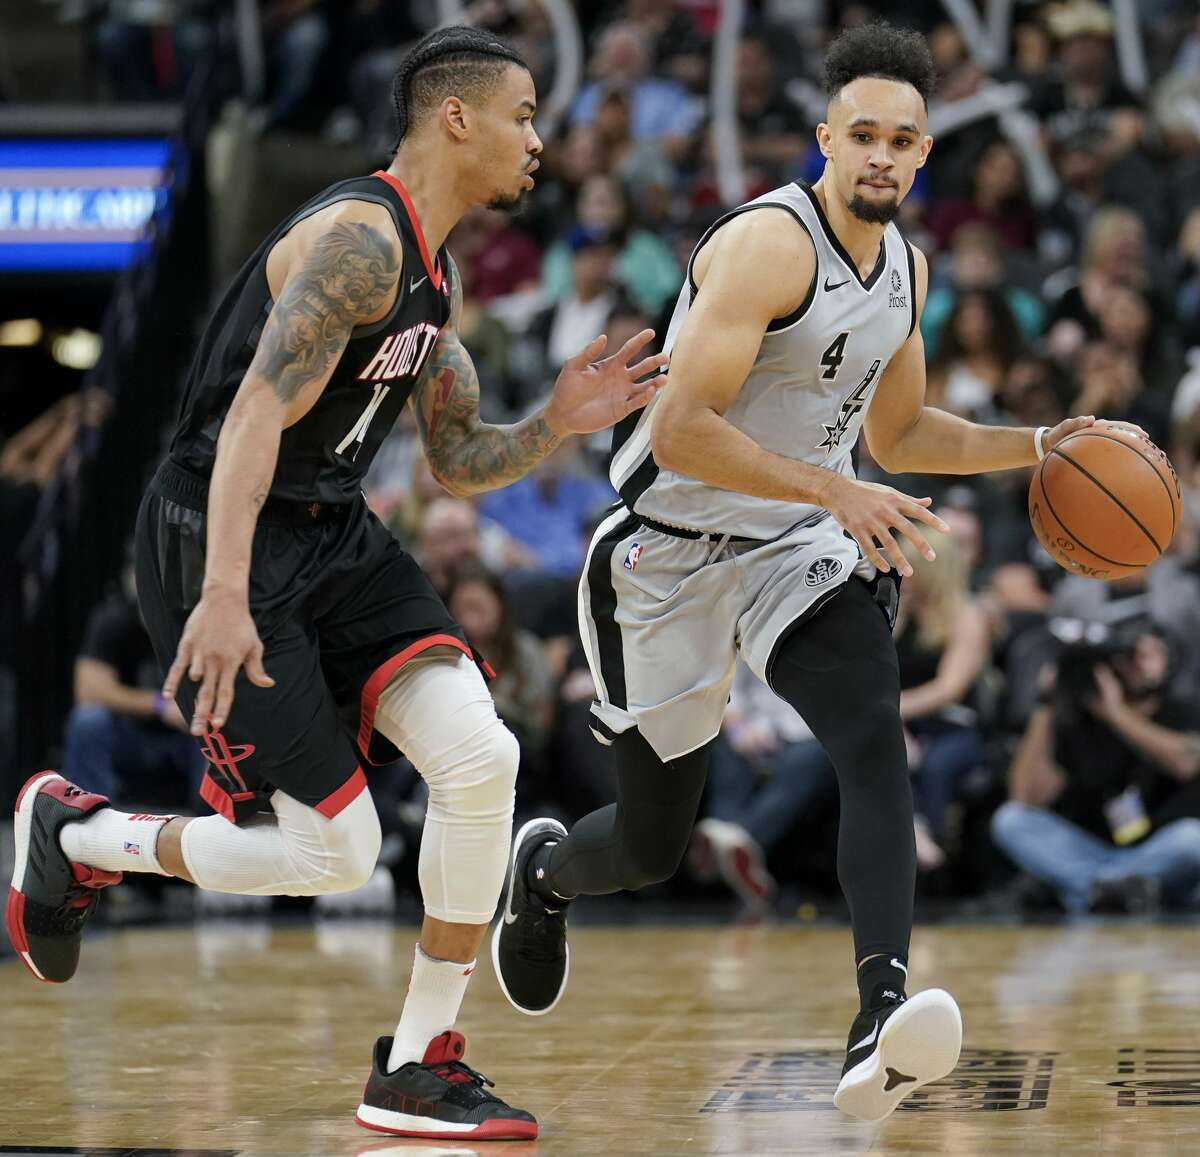 San Antonio Spurs' Derrick White (4) drives against Houston Rockets' Gerald Green during the second half of an NBA basketball game, Friday, Nov. 30, 2018, in San Antonio. (AP Photo/Darren Abate)